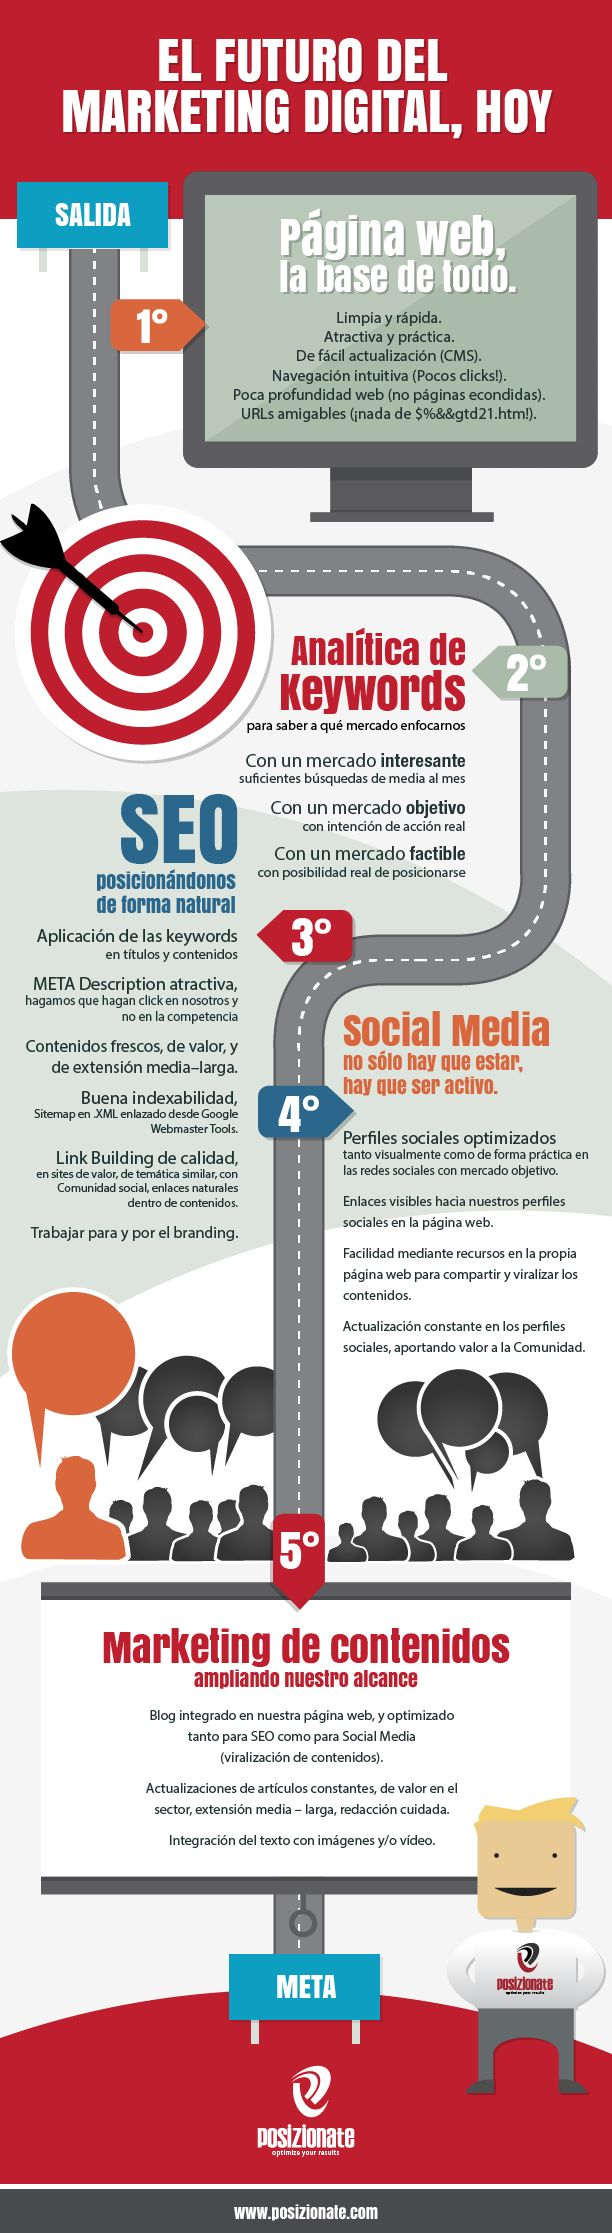 El futuro del #marketing digital, hoy #Infografia @Virginia Kraljevic Jiménez | Conecta Social Media